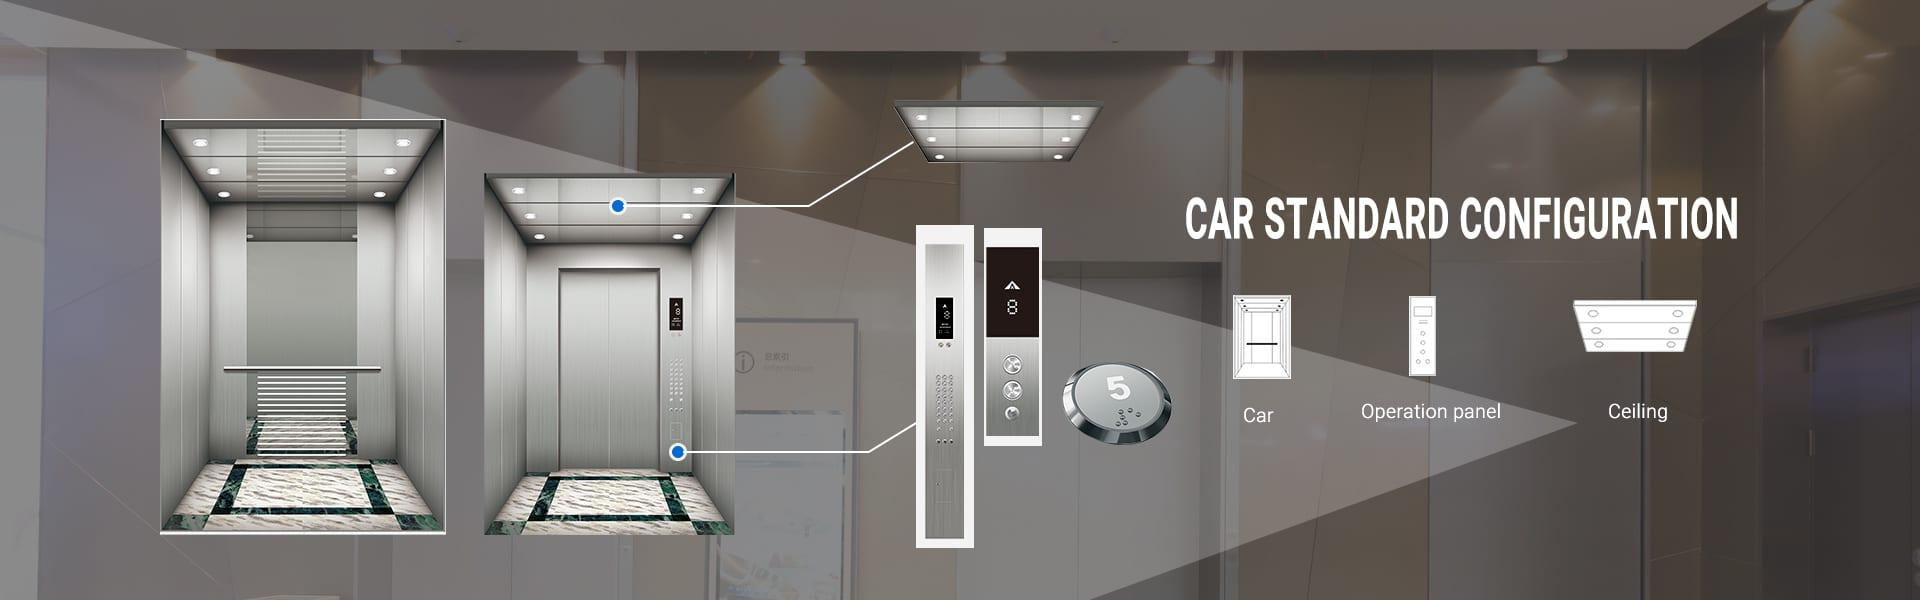 Car standard configuration